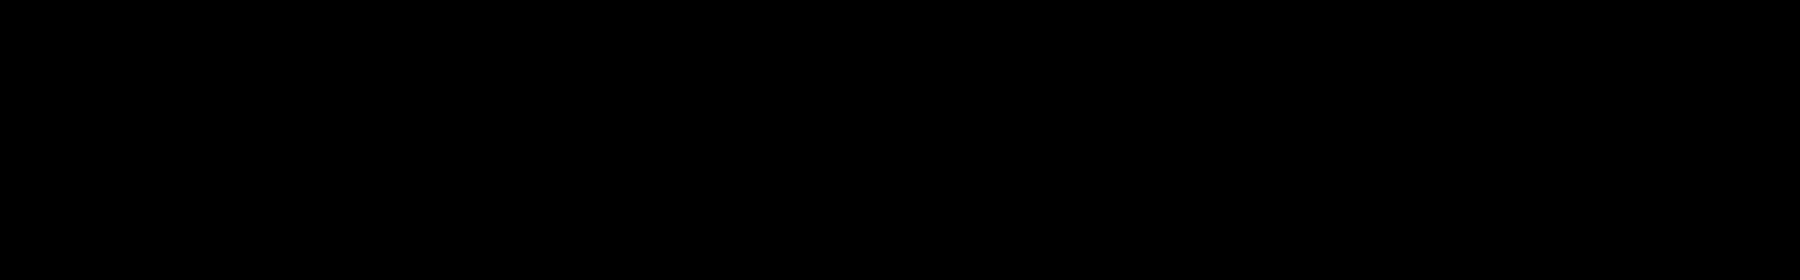 Basement Freaks Presents Middle East Guitars audio waveform